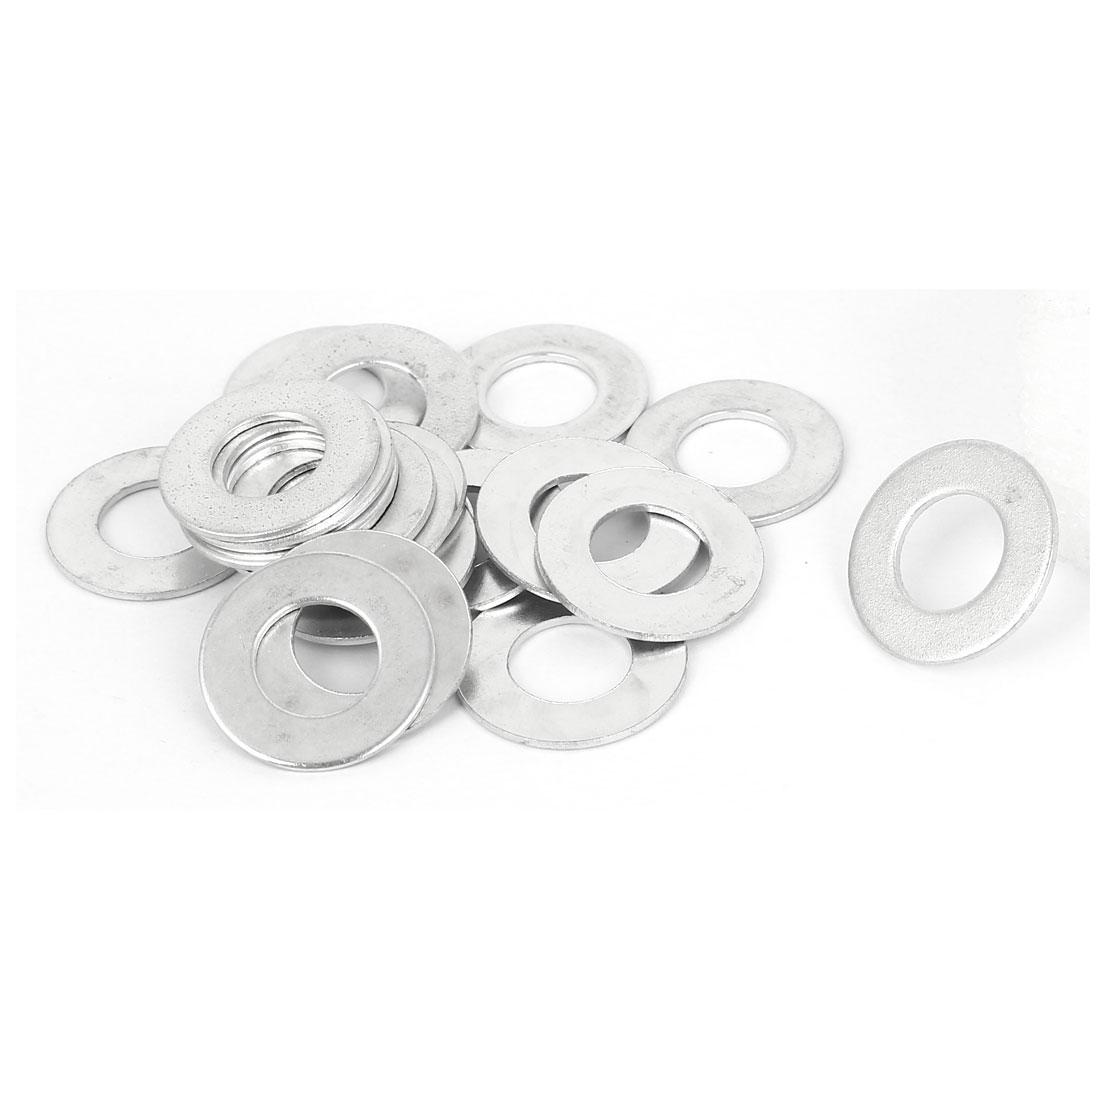 10mm x 20mm x 1mm Zinc Plated Flat Spacers Washers Gaskets Fasteners GB97 20PCS